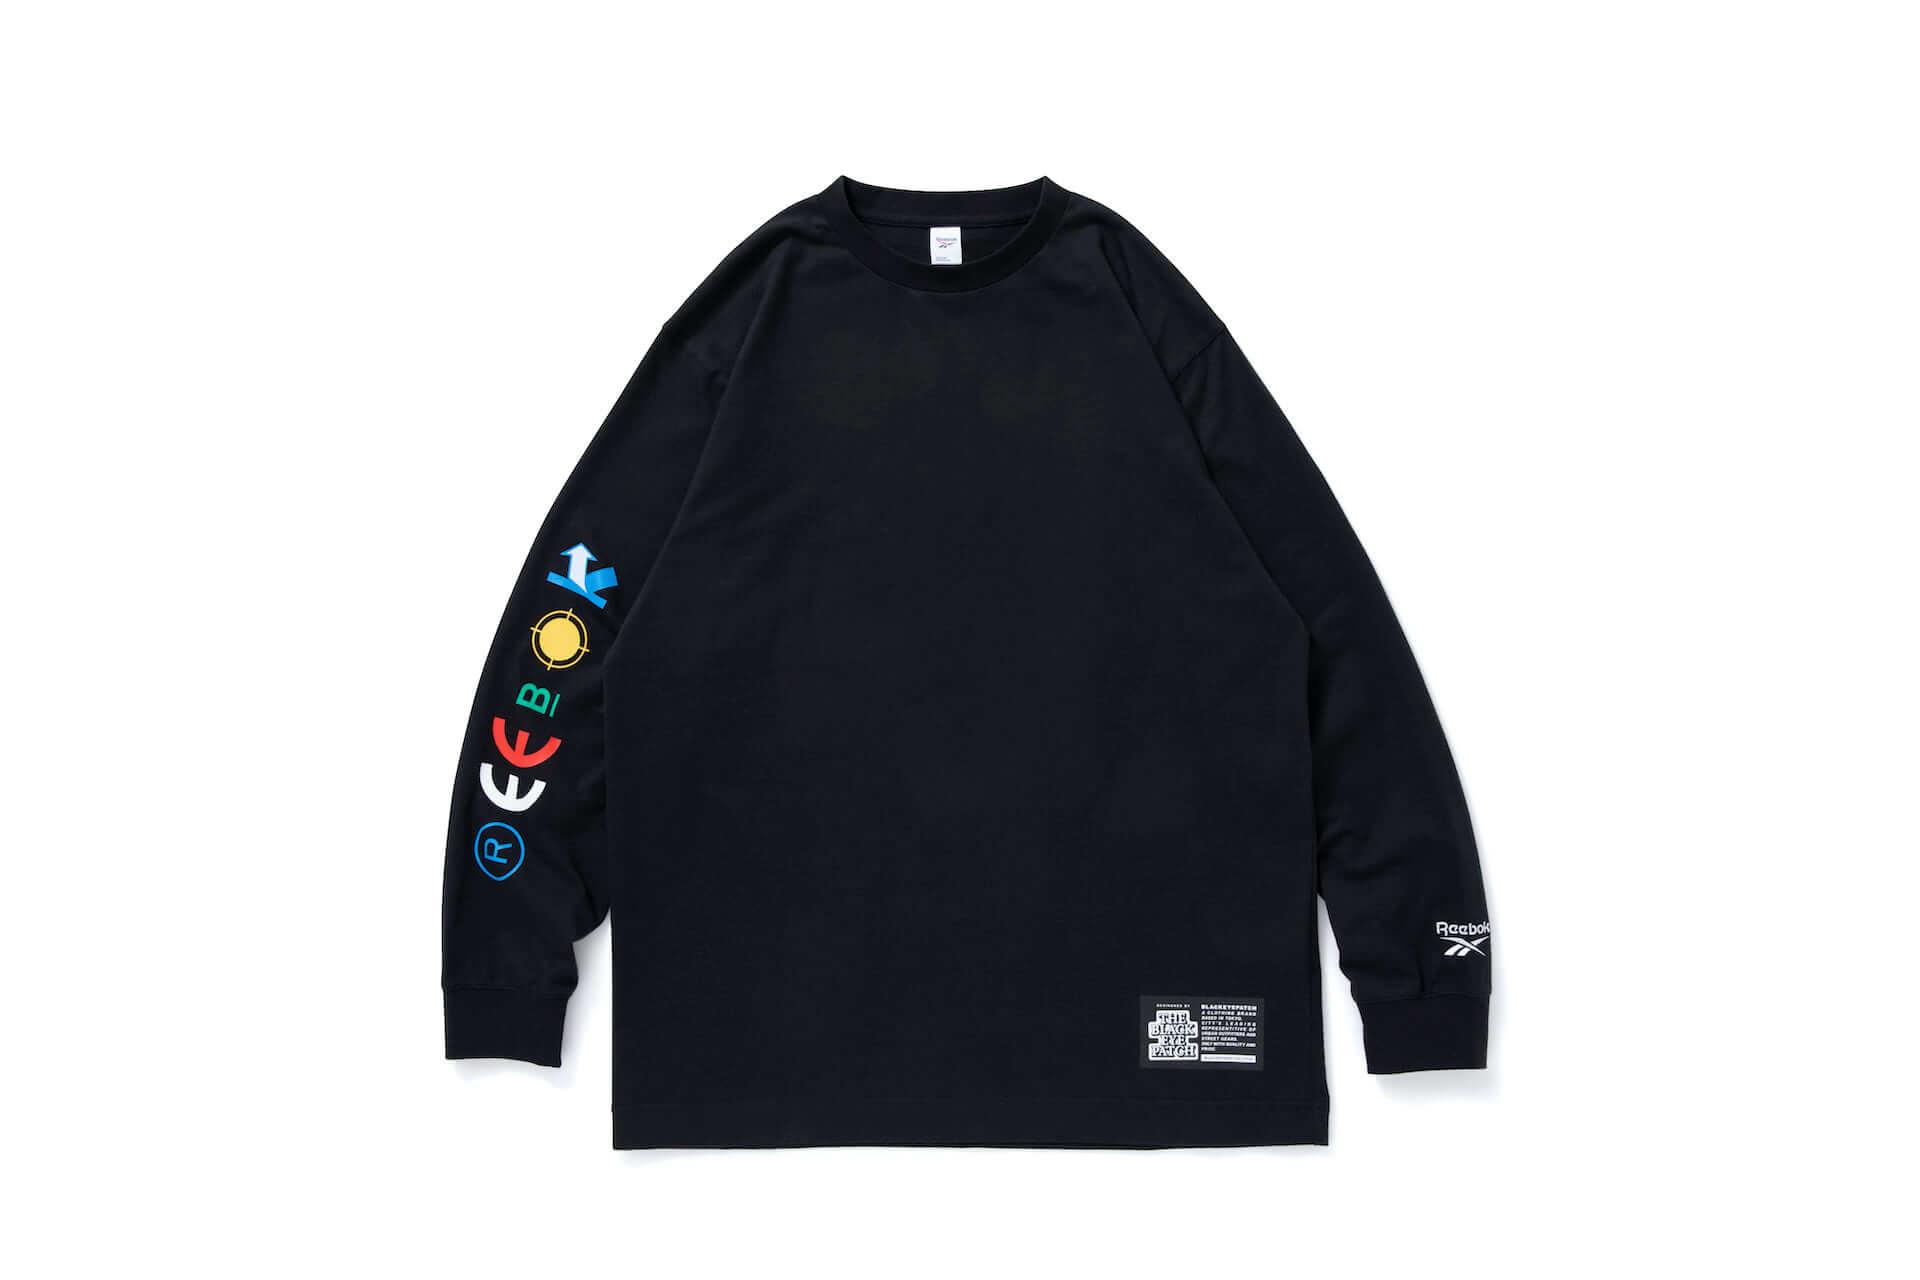 BlackEyePatchがReebokのデザインを再構築!「CLUB C BEP」やTシャツ含むフルコレクションが登場 lf200716_reebok_16-1920x1280